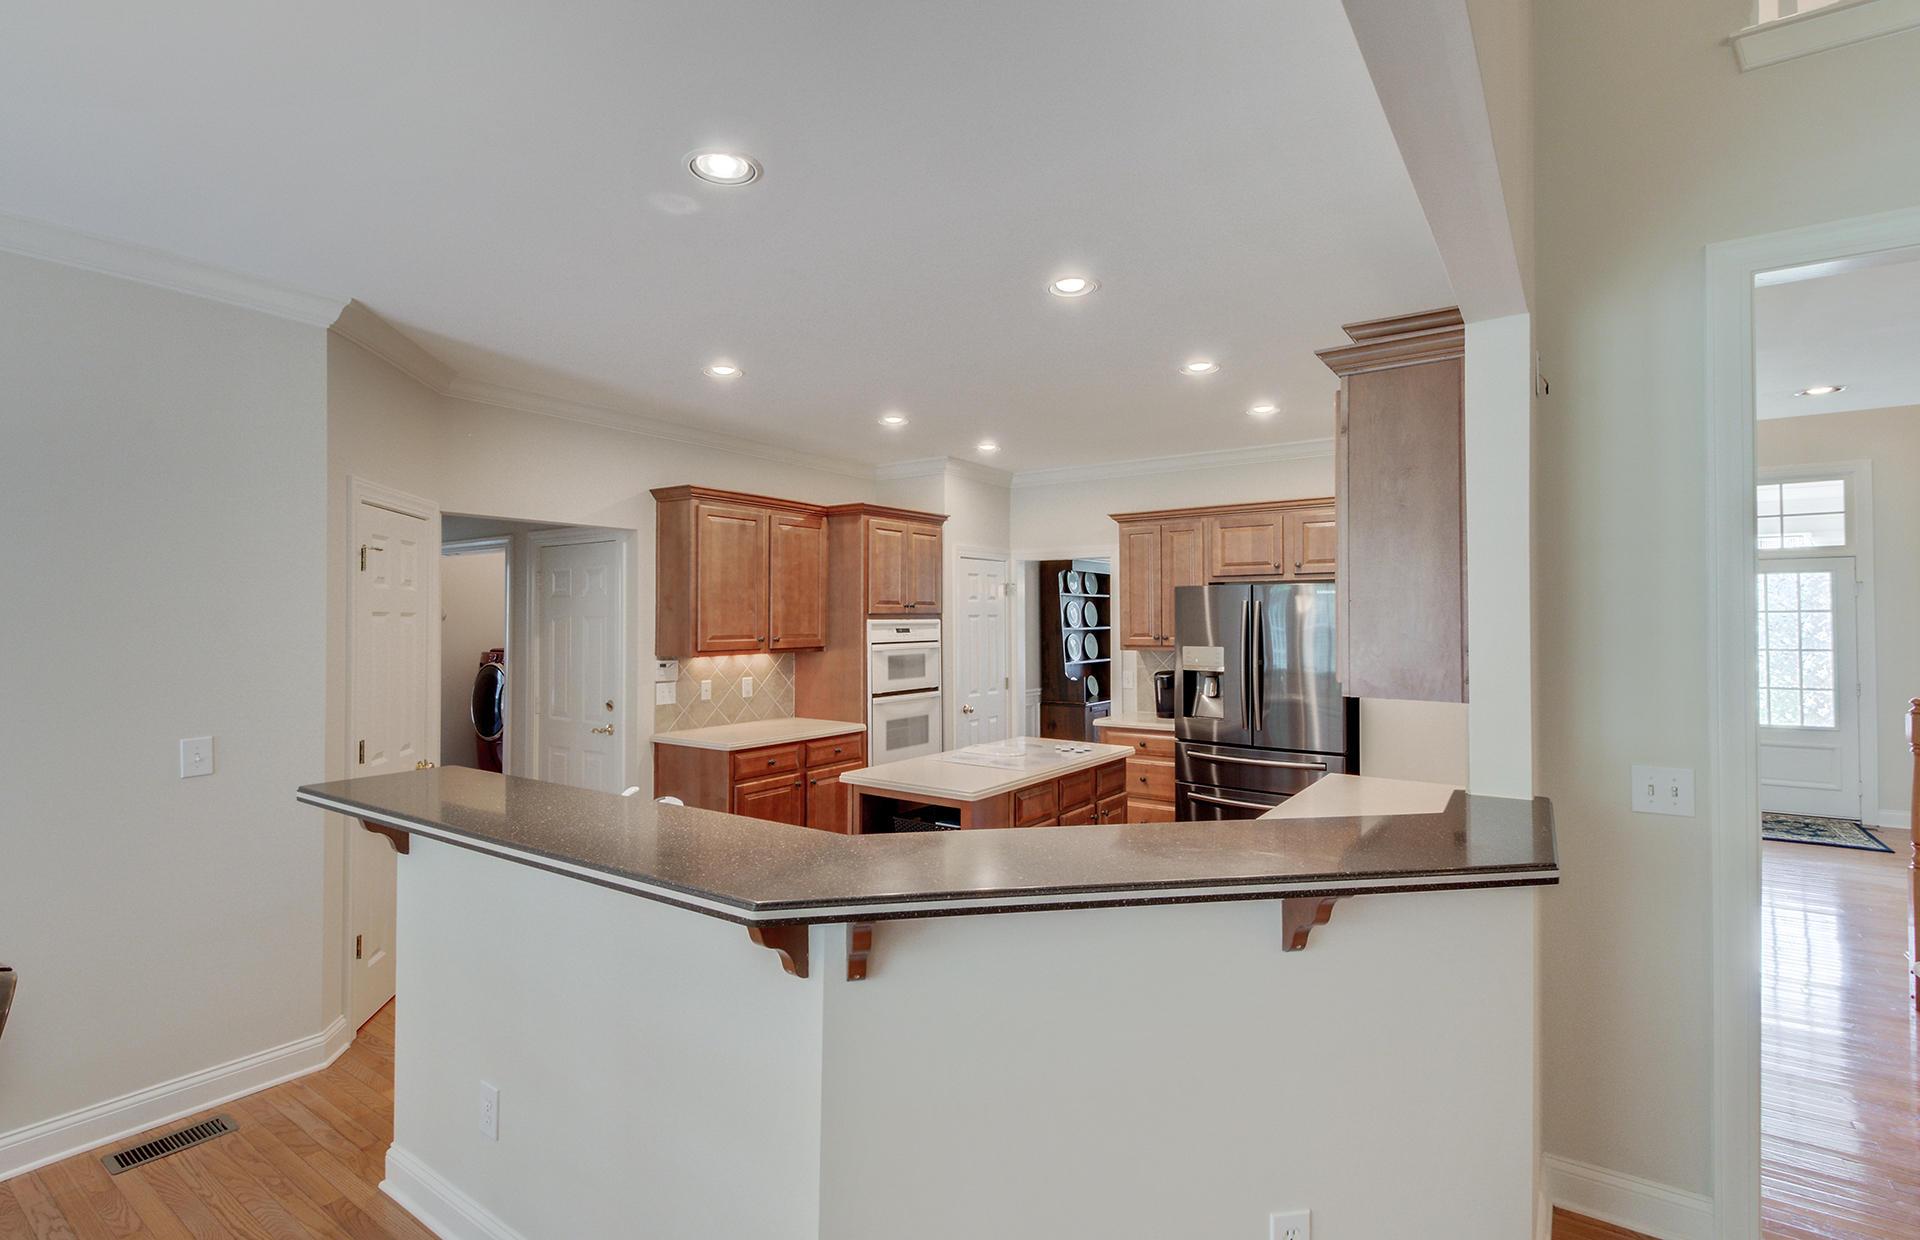 Dunes West Homes For Sale - 2453 Darts Cove, Mount Pleasant, SC - 45